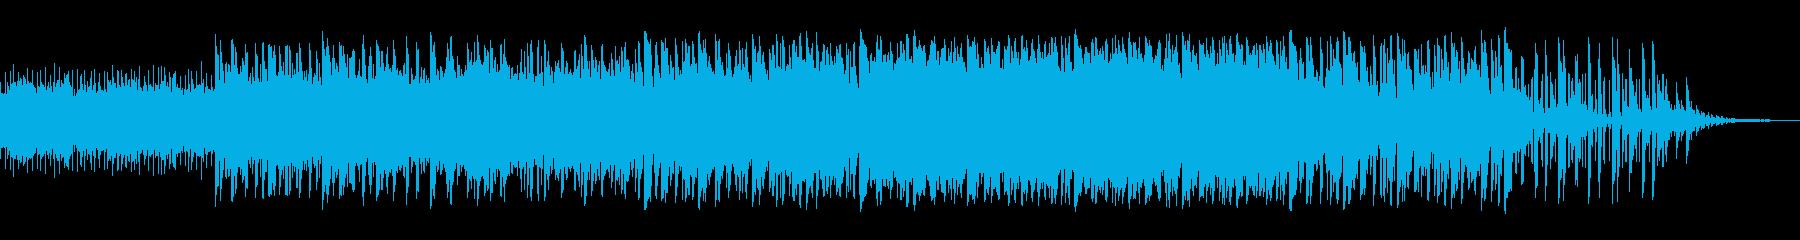 SFゲームなBGMの再生済みの波形